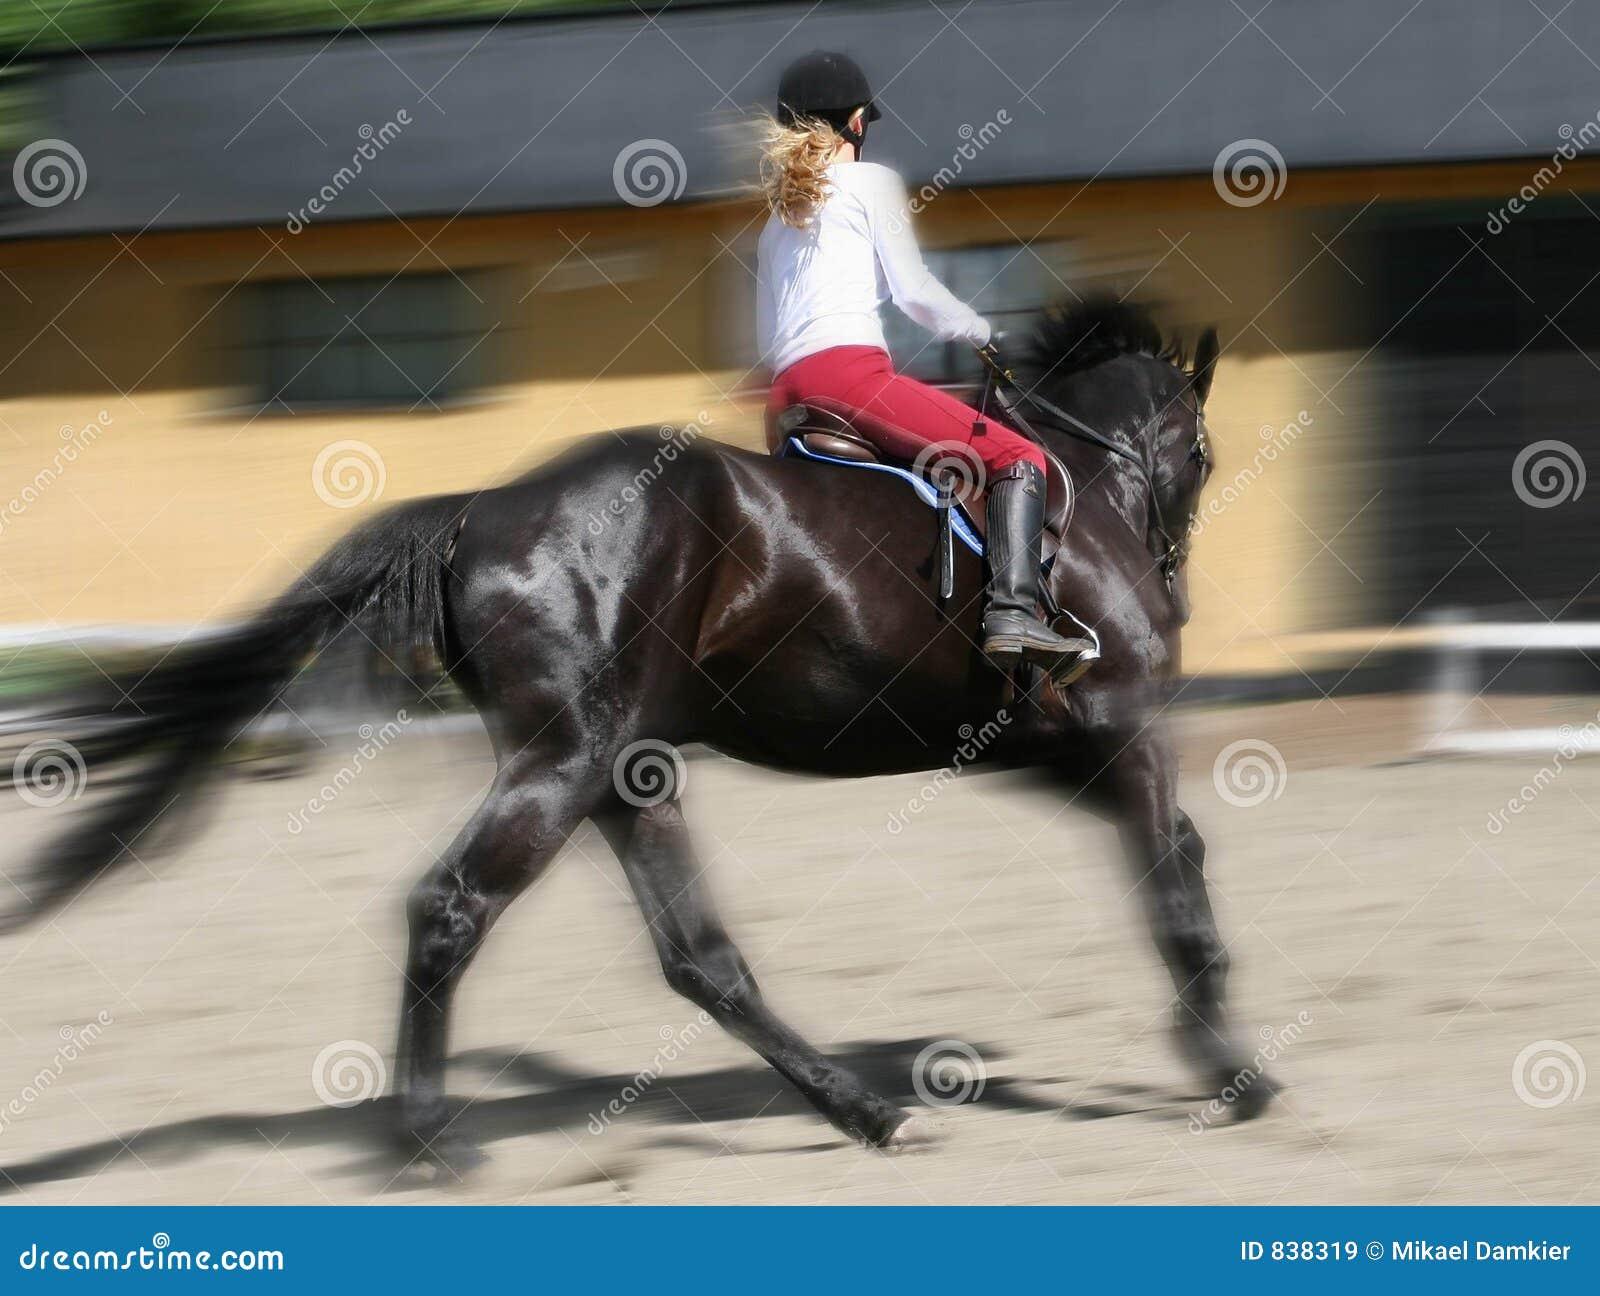 Women riding